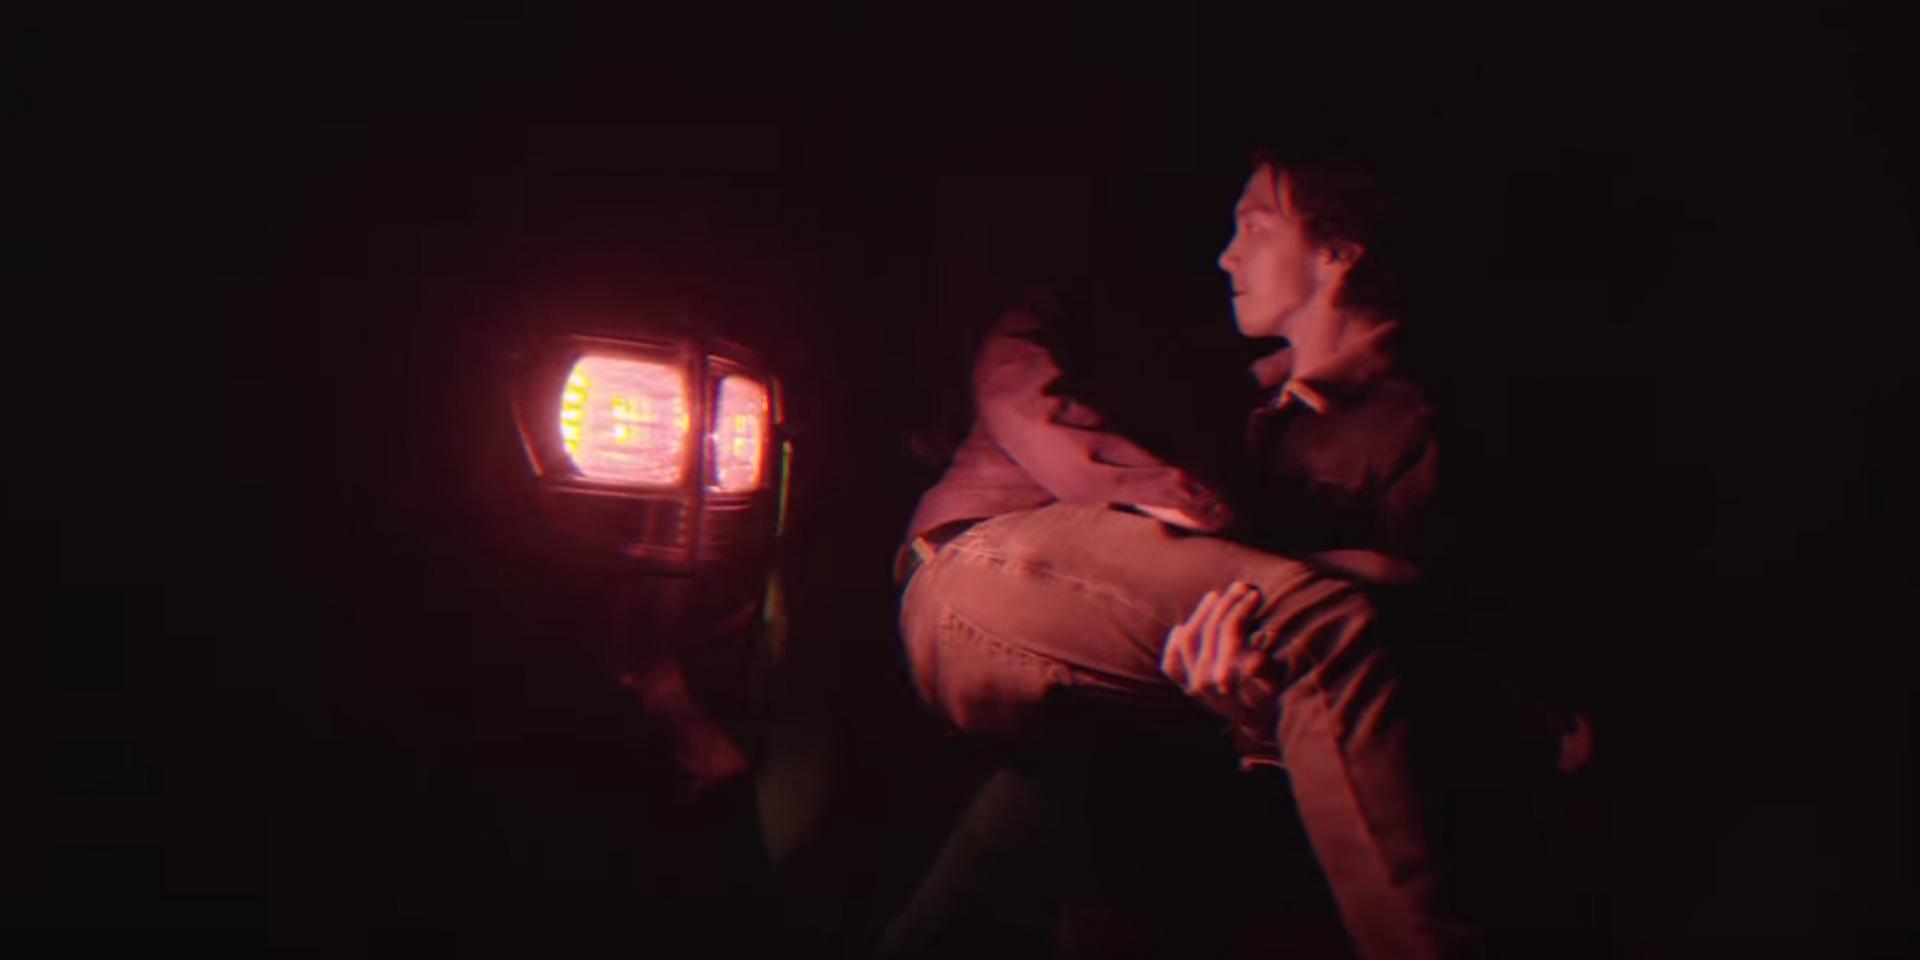 Sandwich release strange 'Parang Walang Nangyari' music video – watch